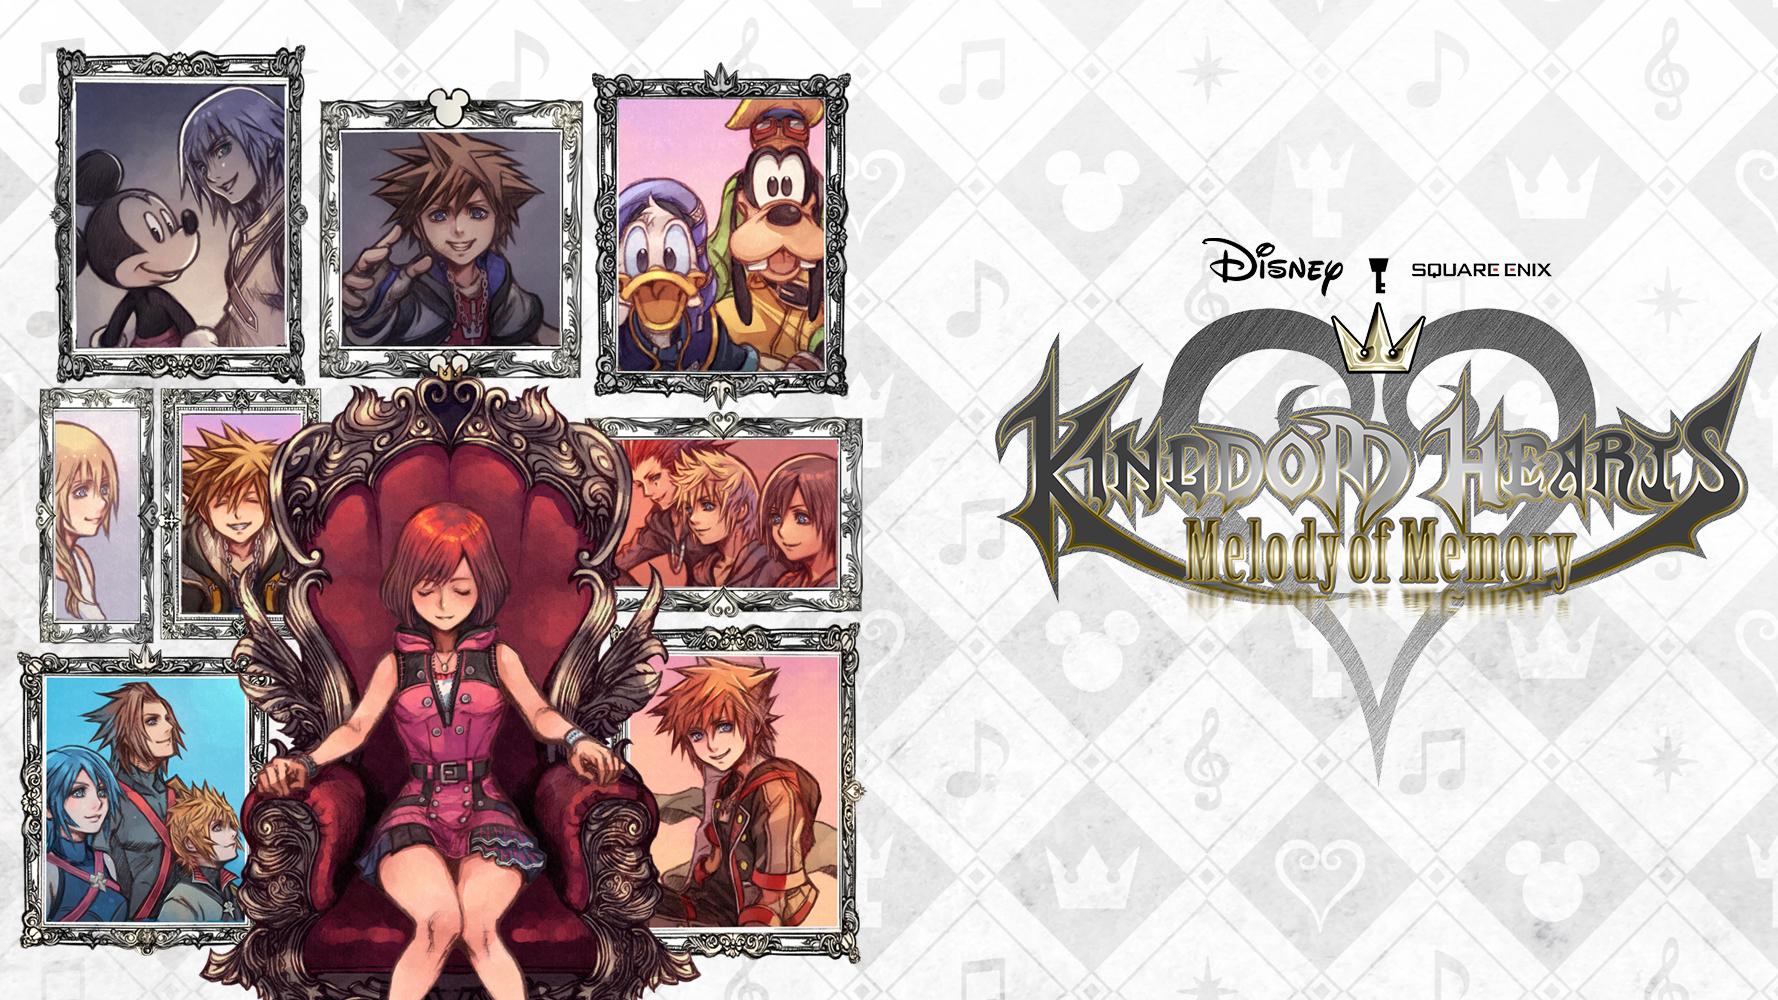 Kingdom Hearts: Melody of Memory artwork